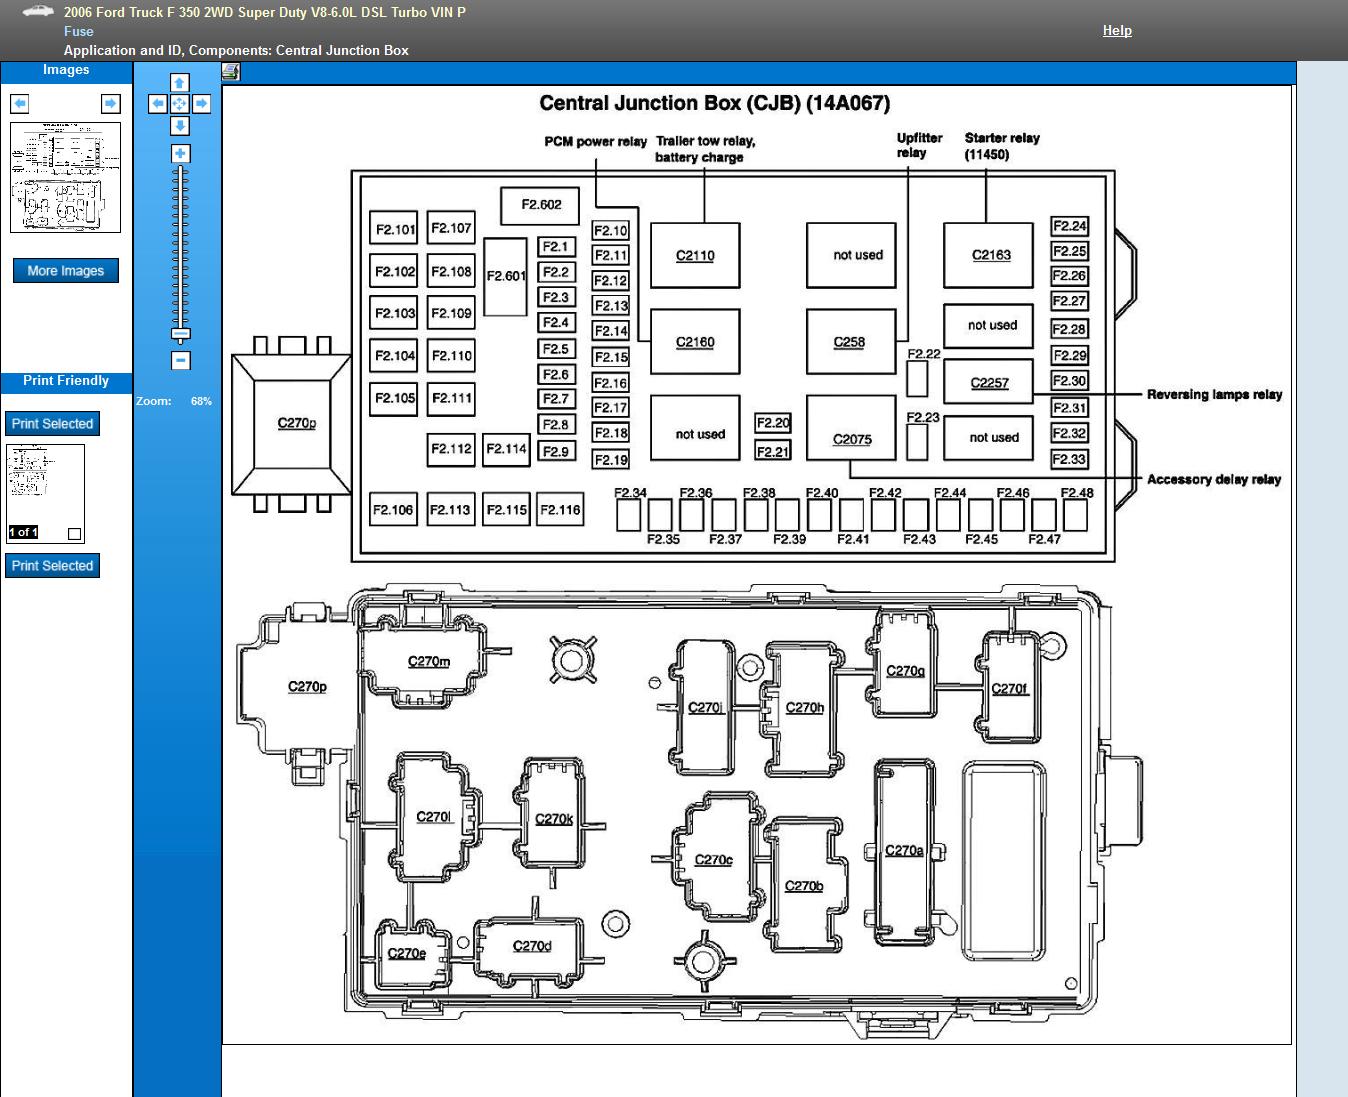 i need a diagram of the fuse box on my 2006 f350 diesel power stroke rh  justanswer com 2006 f350 6.0 fuse box diagram 2006 f350 diesel fuse panel  diagram